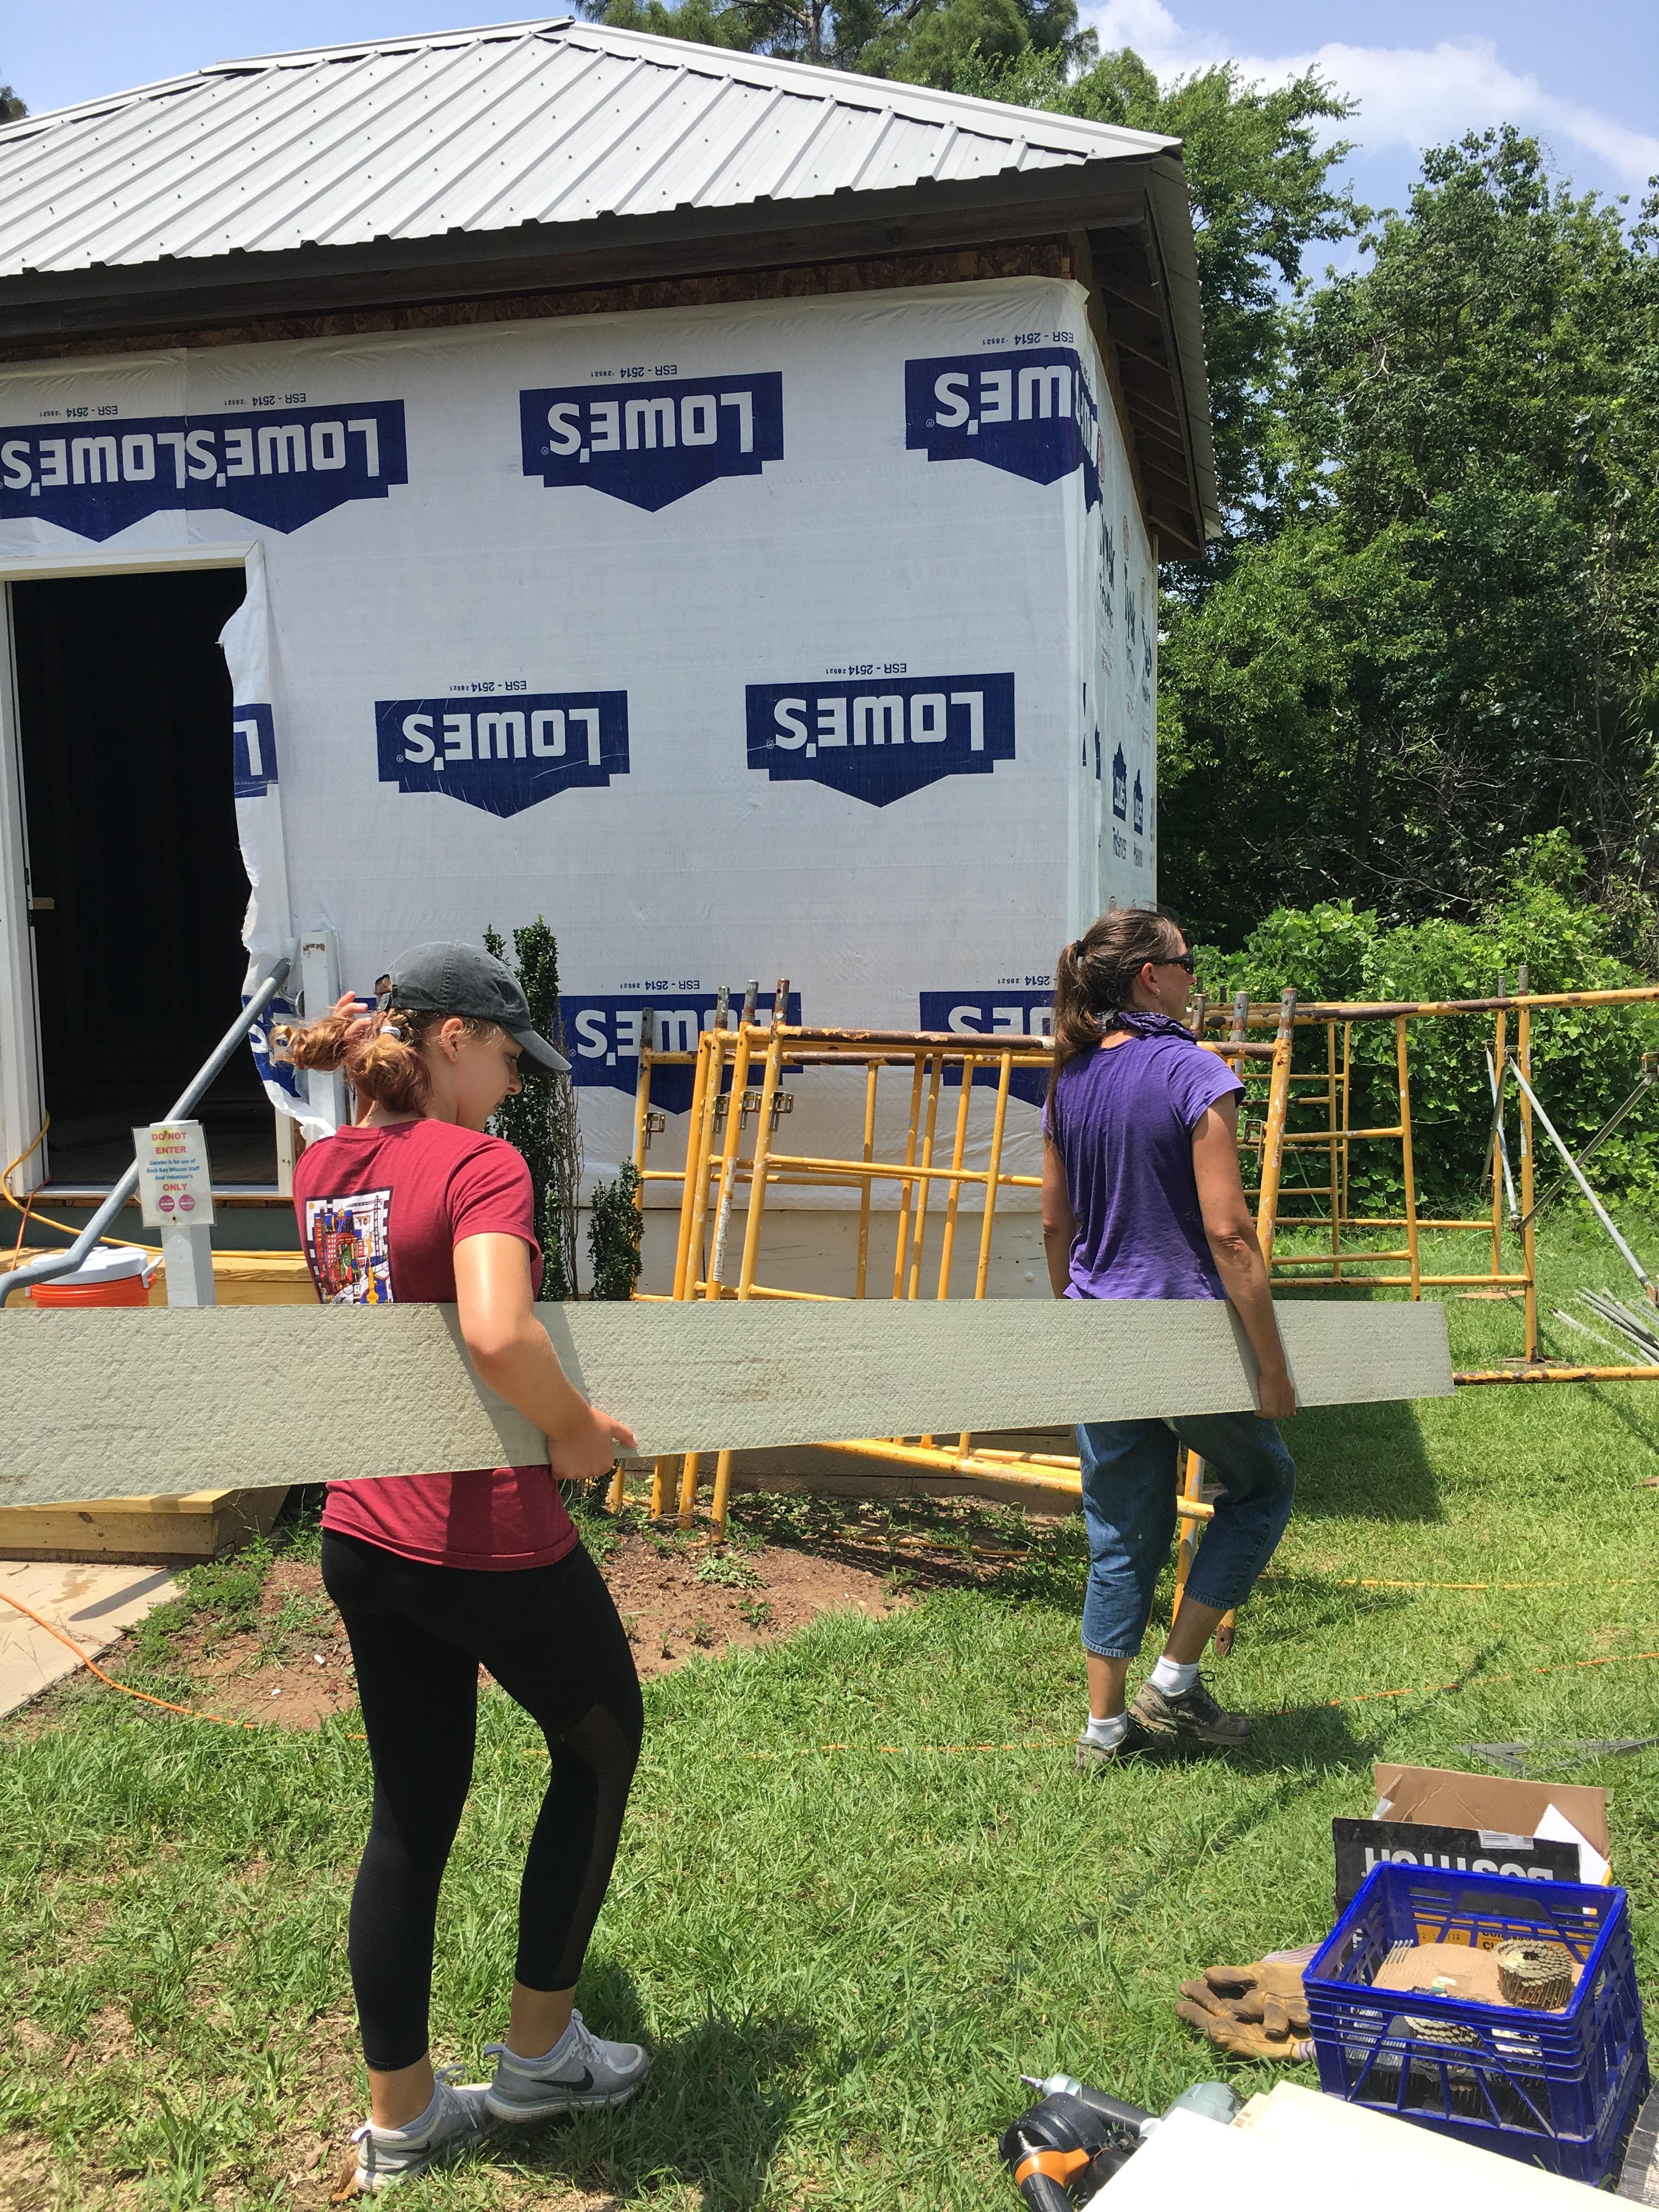 2018 Volunteer Photos: Little River United Church of Christ (Annandale, Virginia)